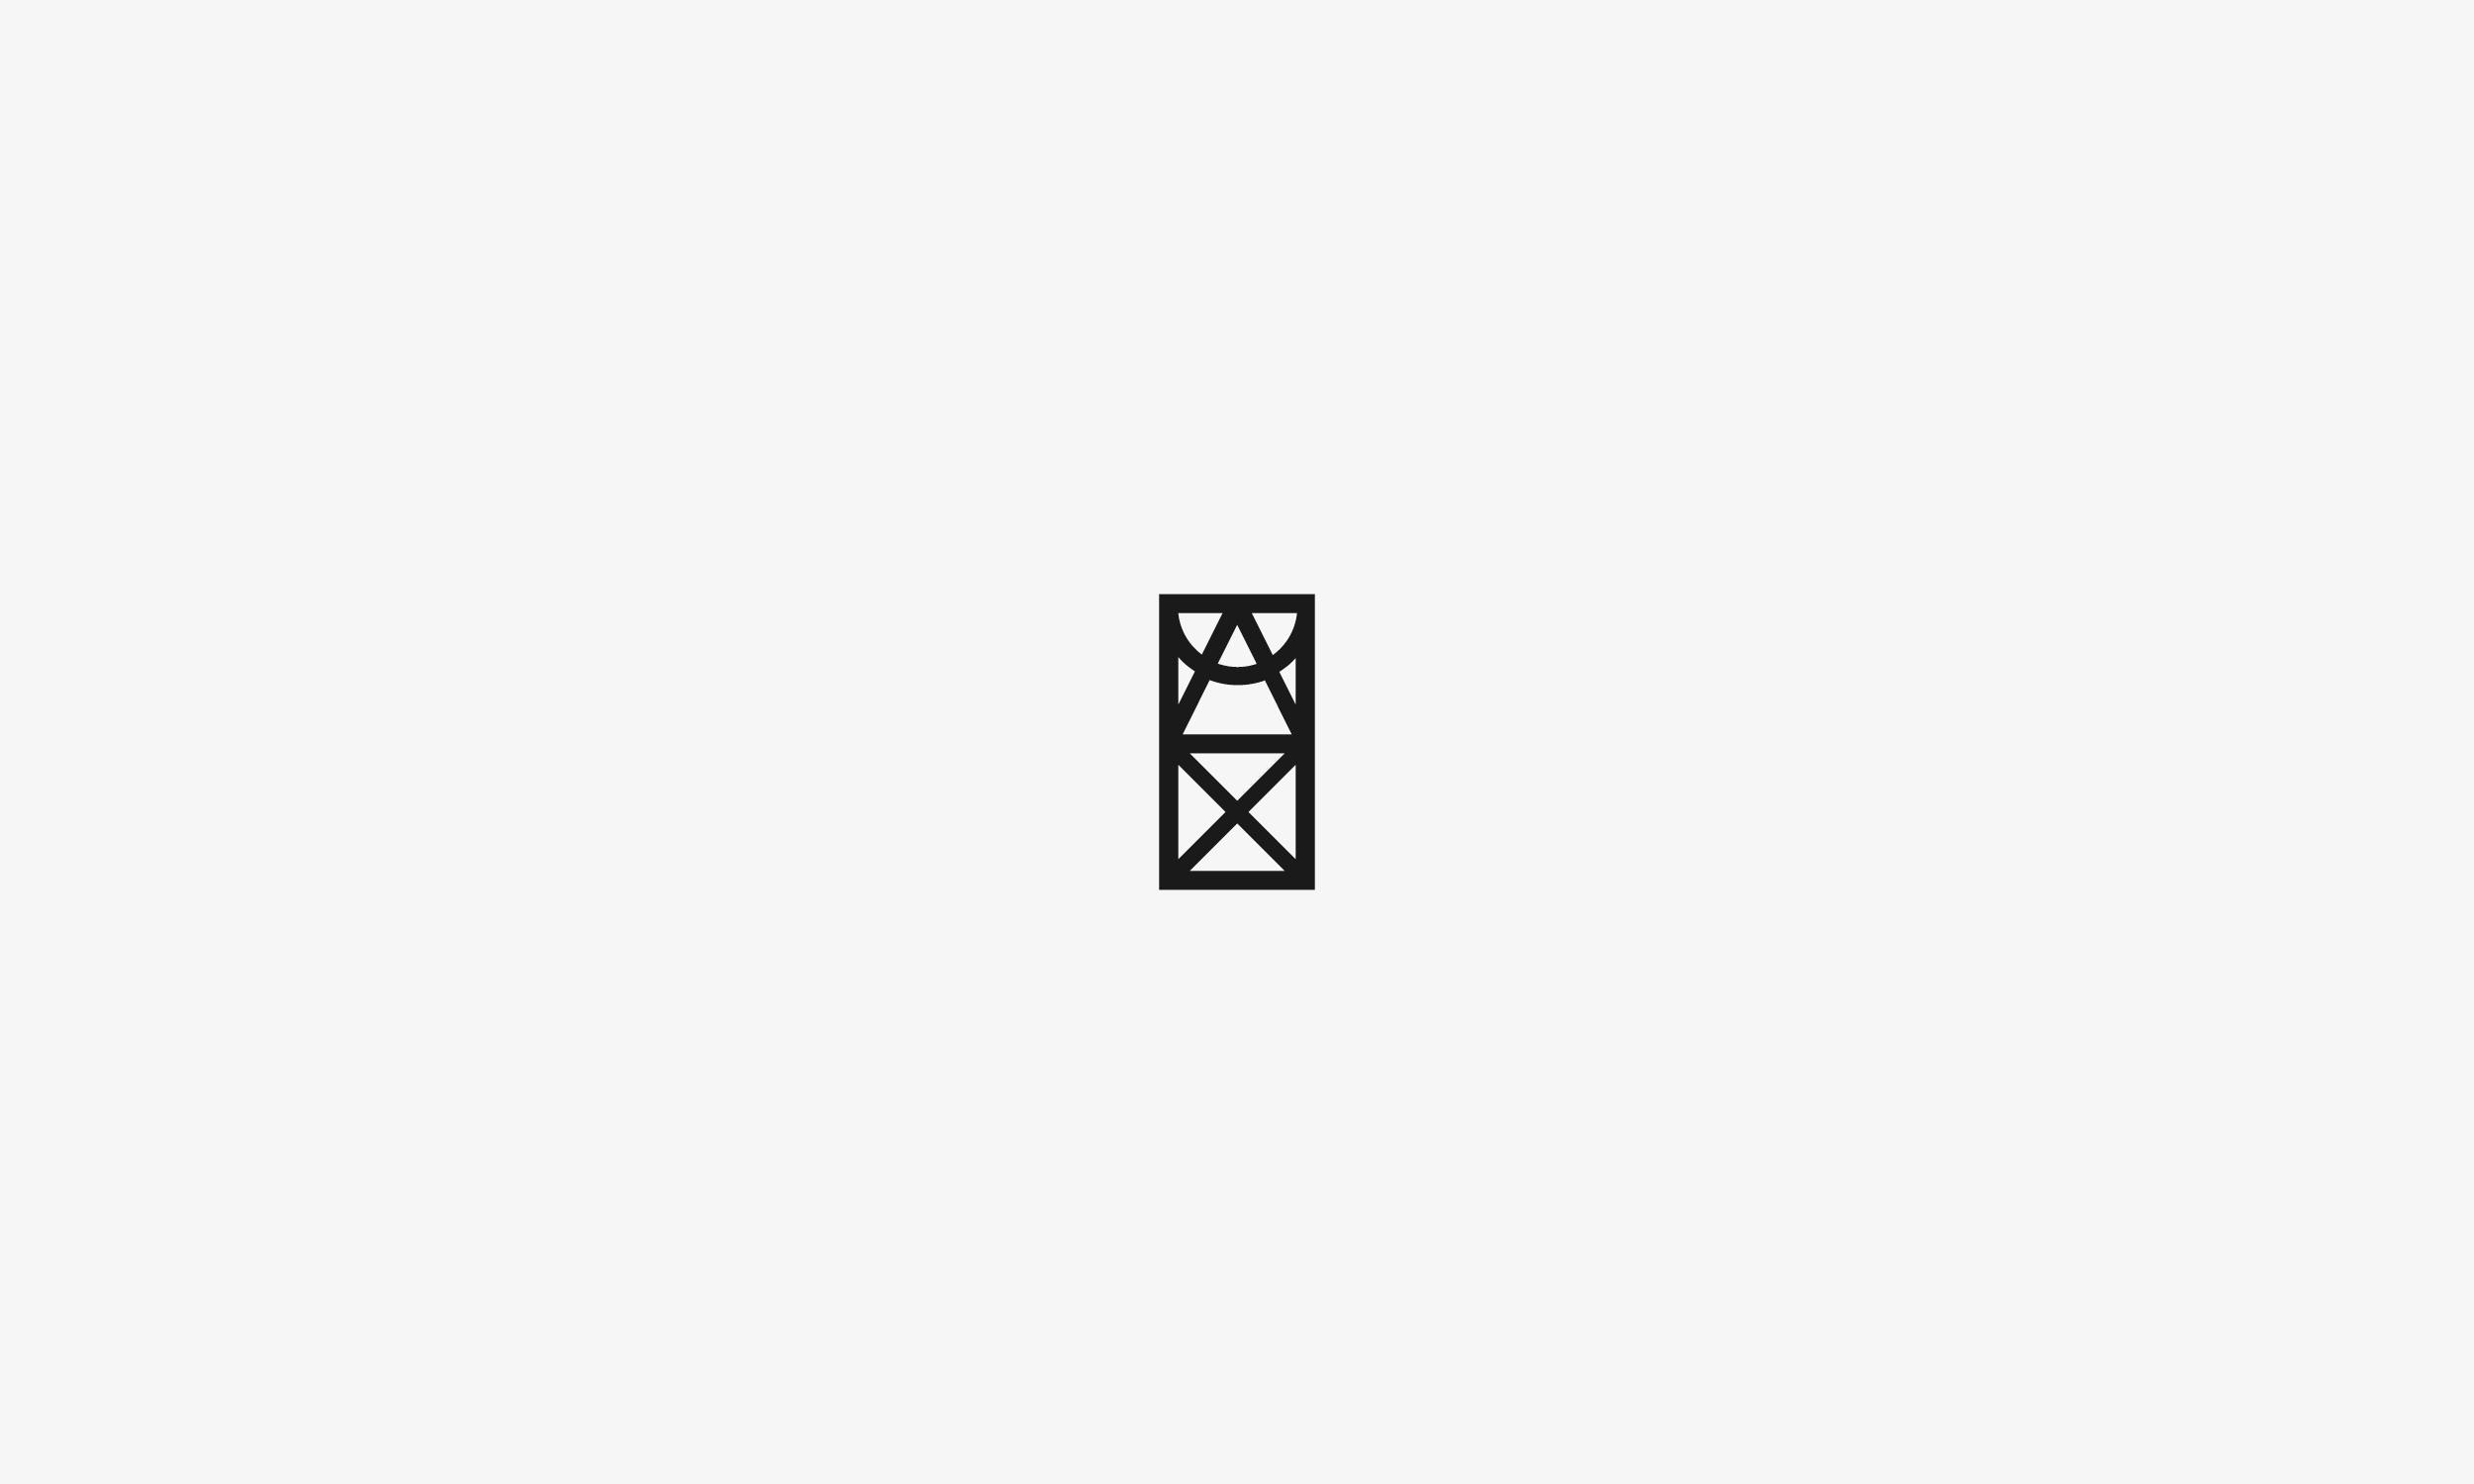 Axiom-Brand-Mark.jpg